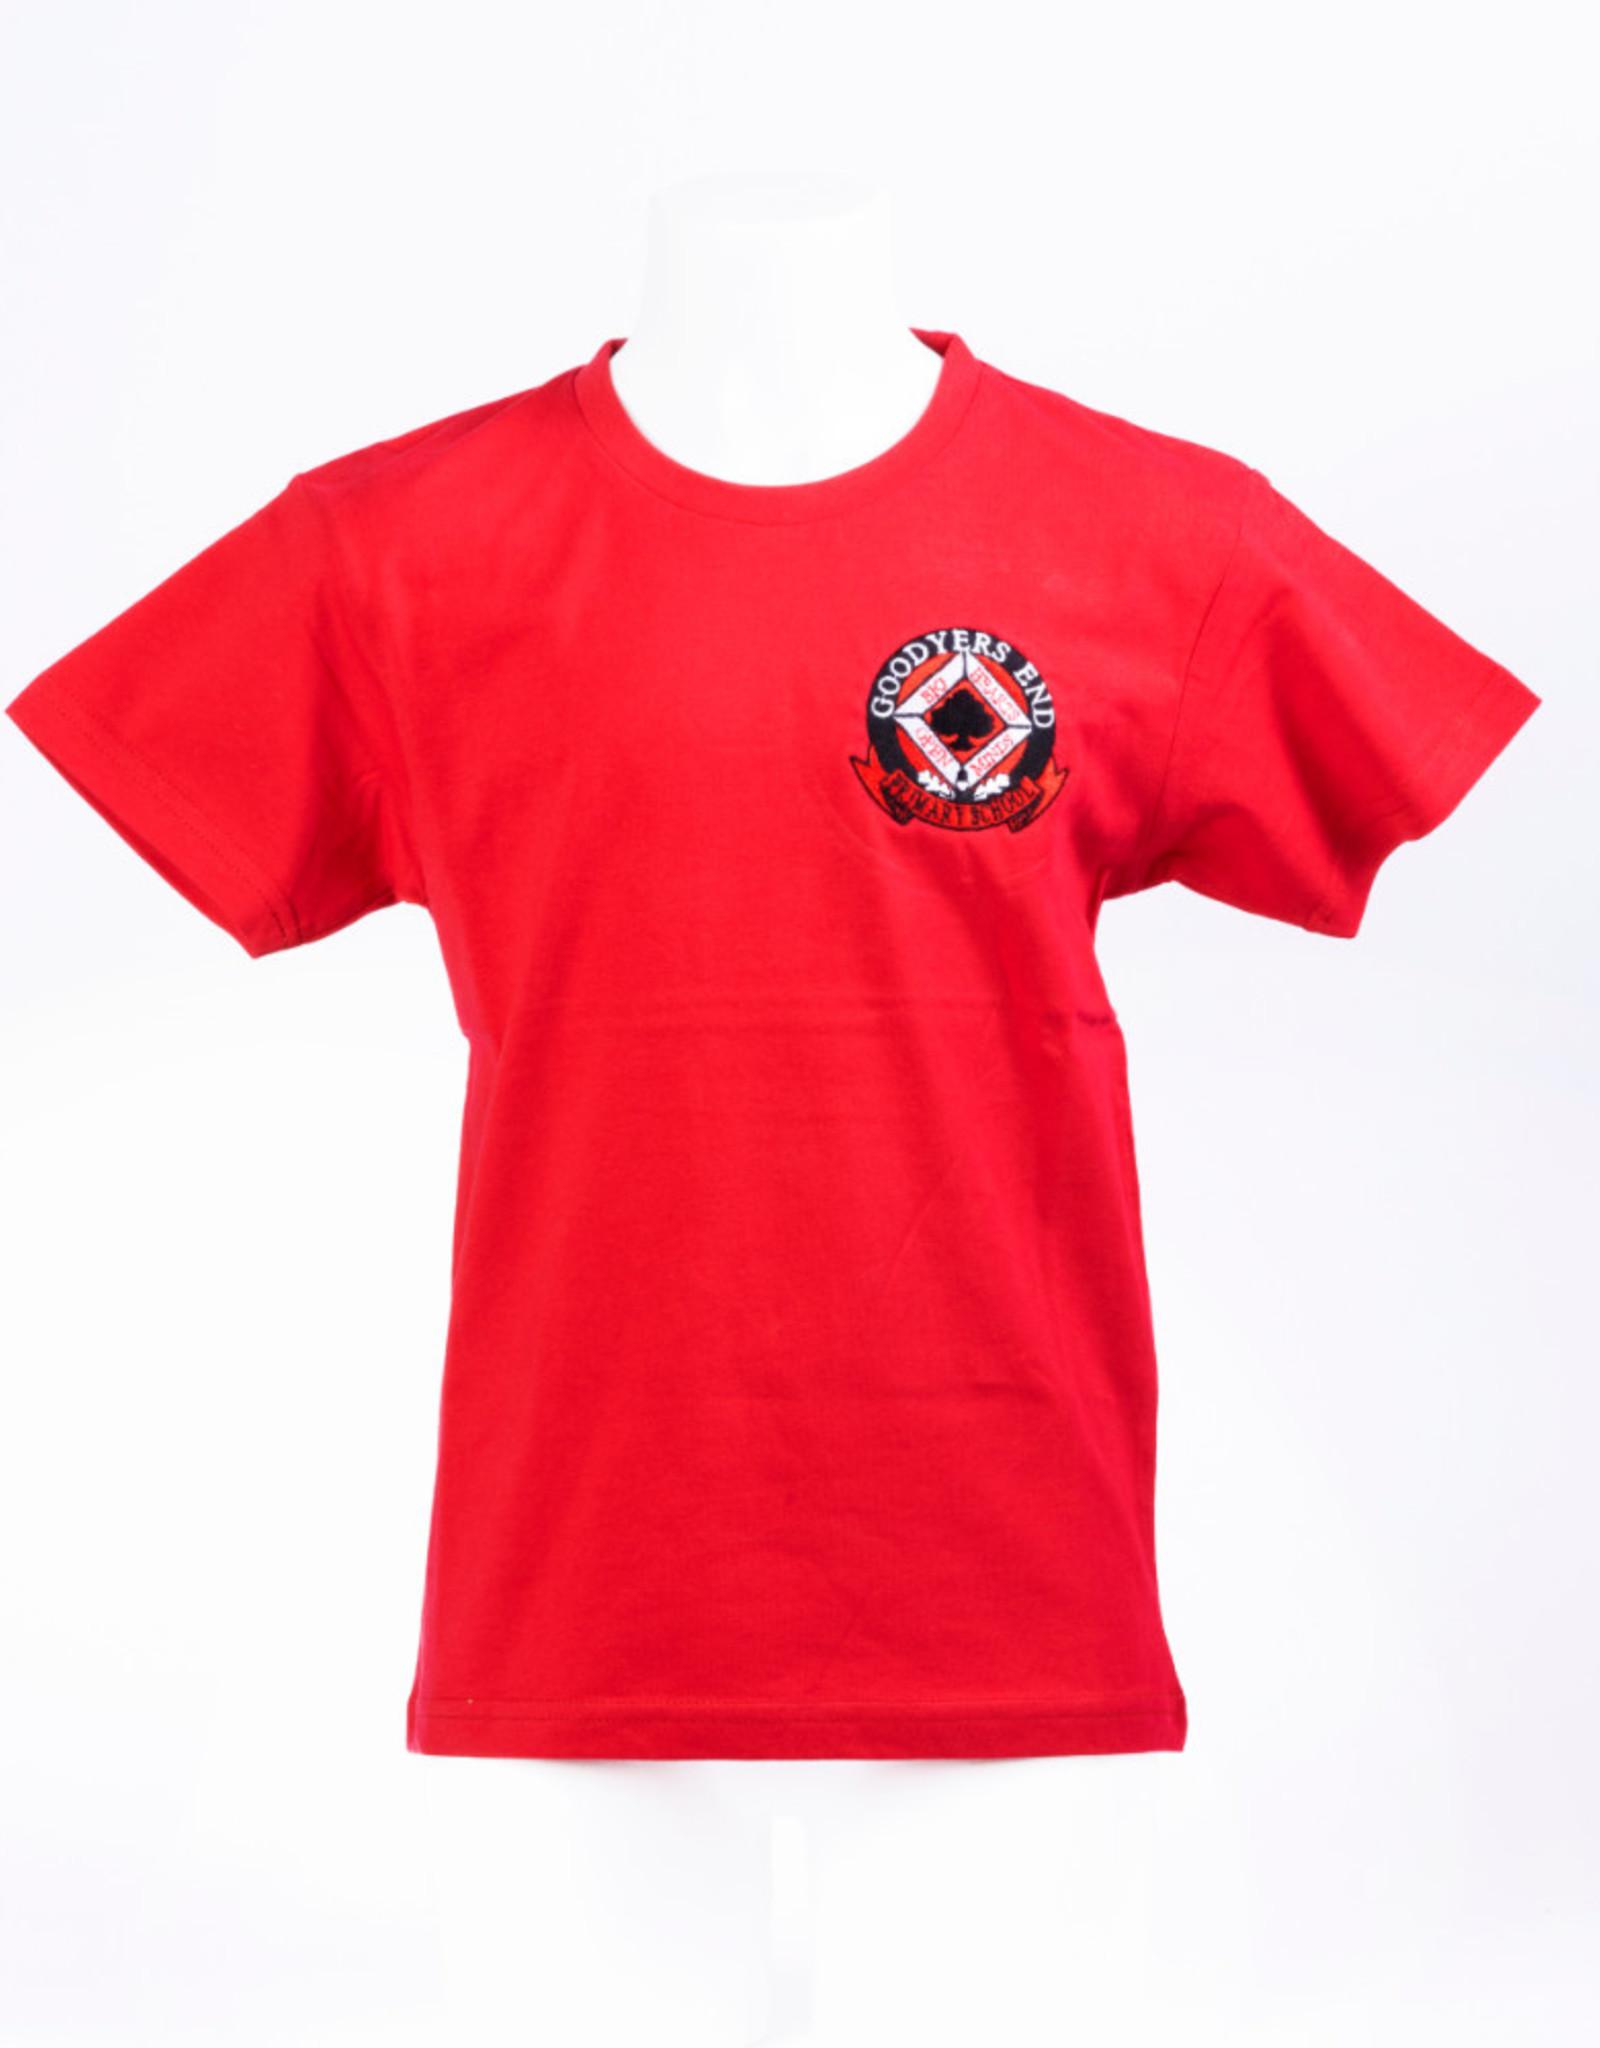 UNEEK T-Shirt Adult Size - Goodyers End School